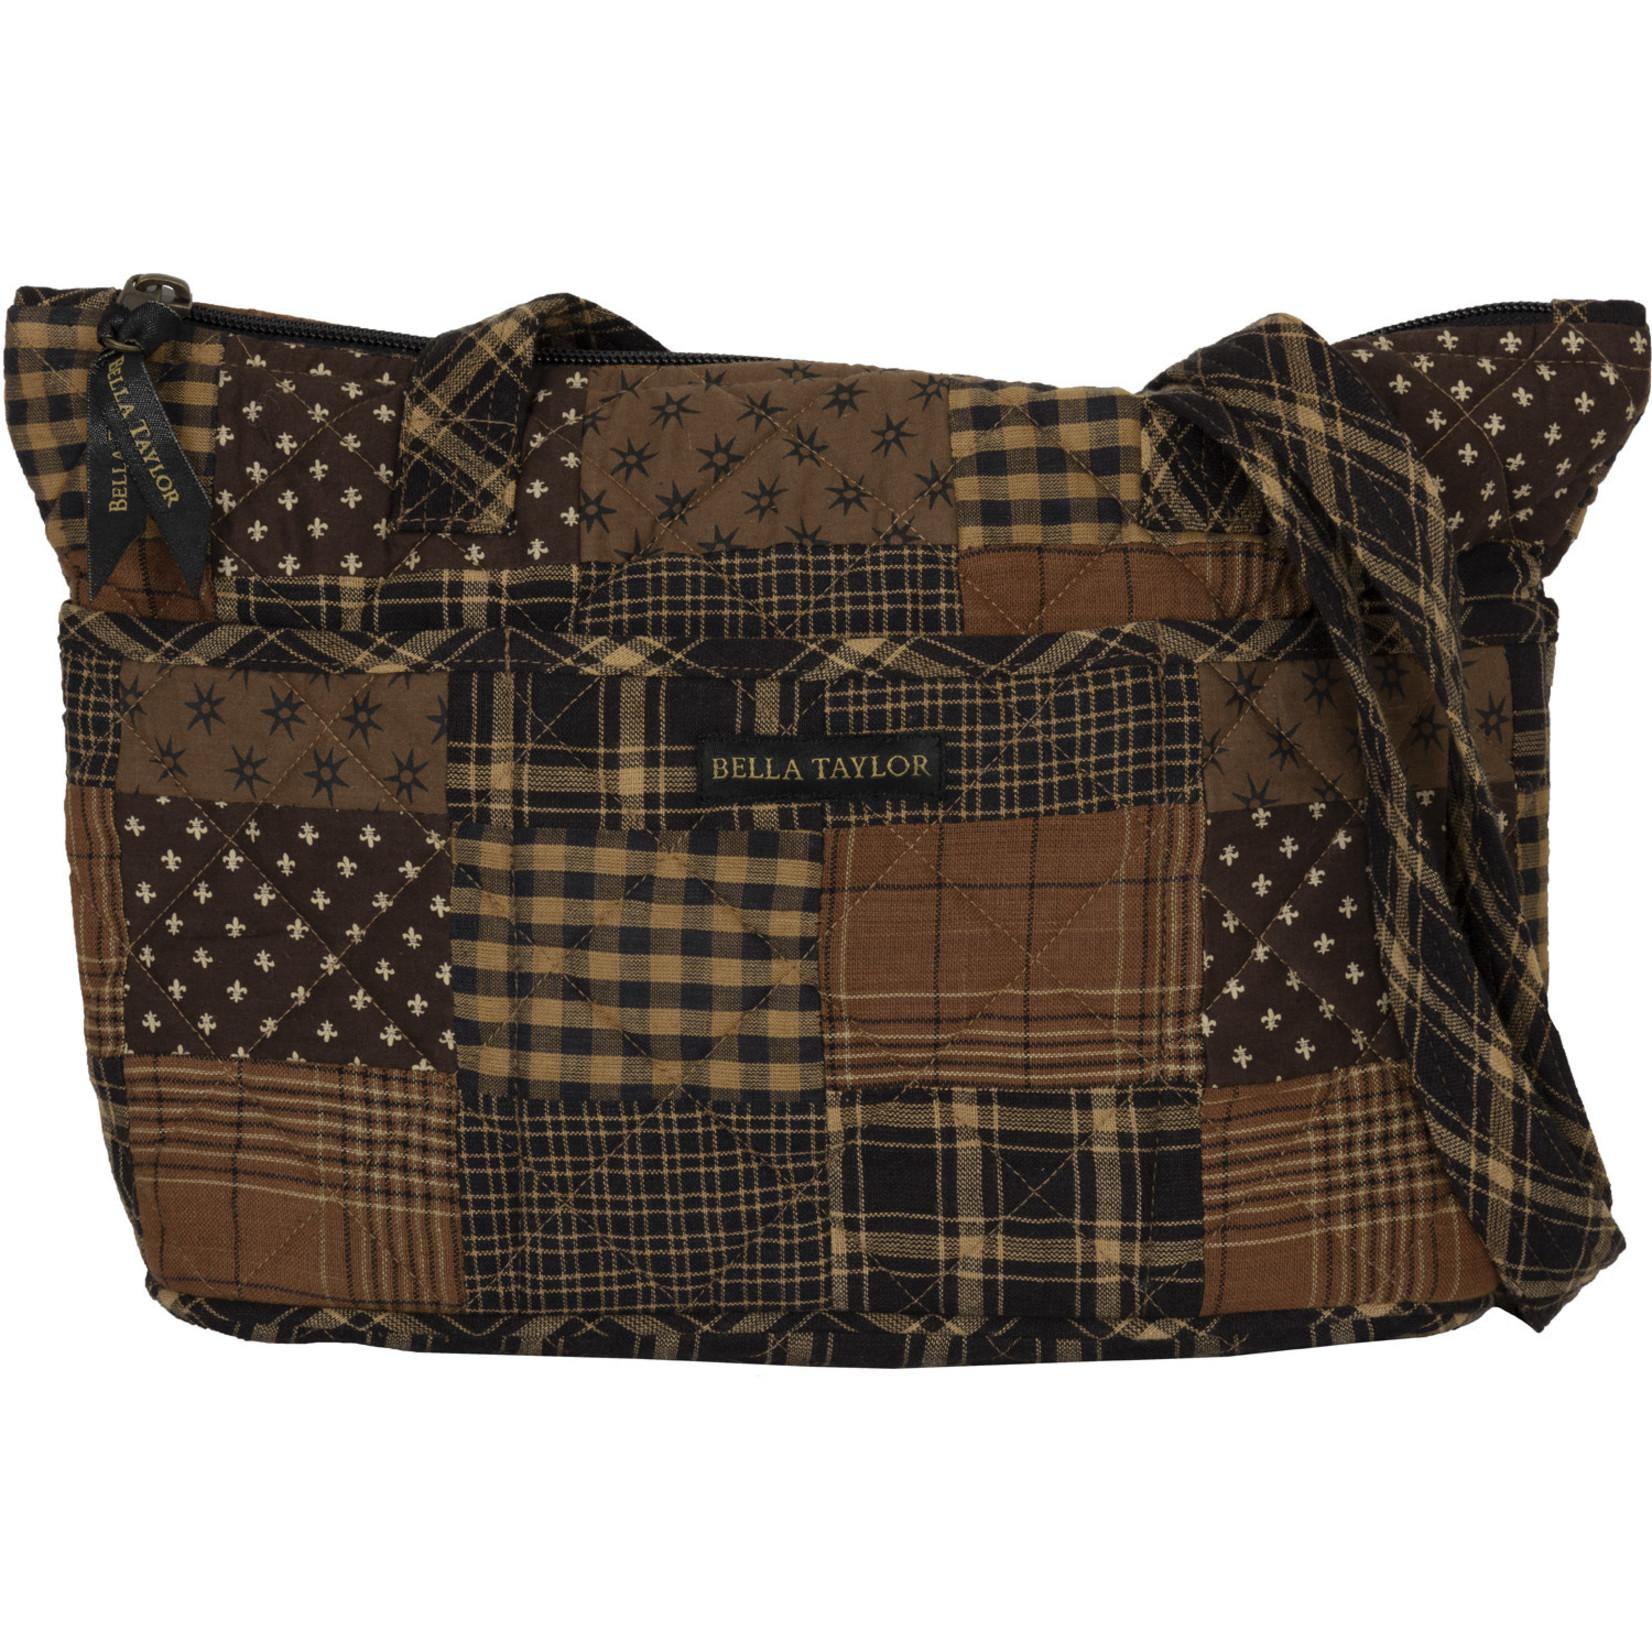 Bella Taylor Ironstone - Taylor handbag